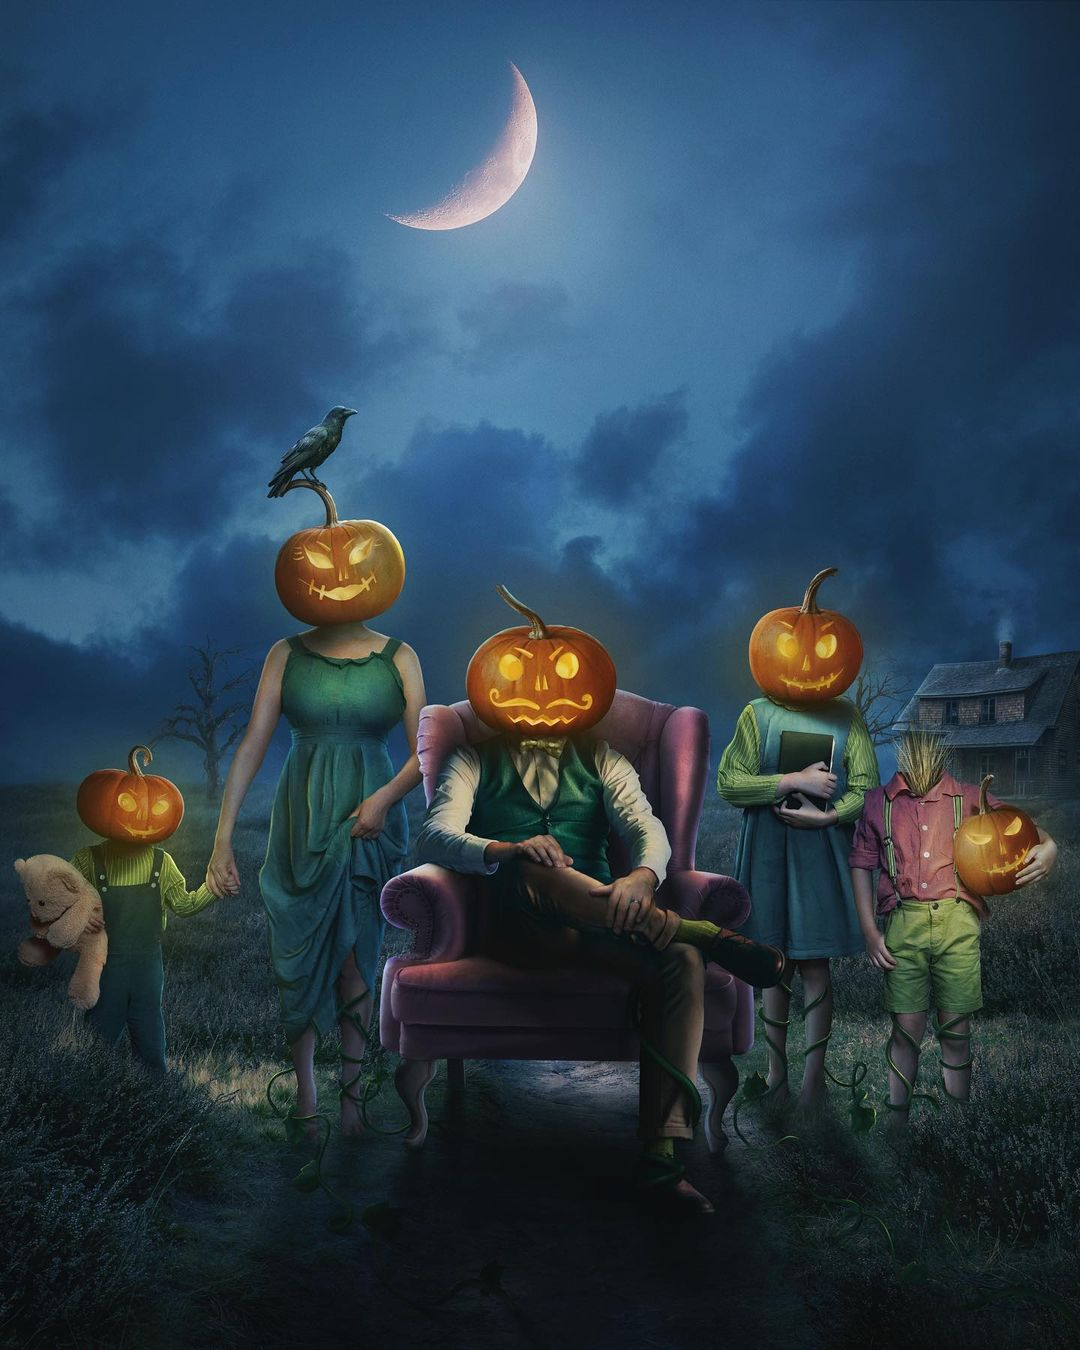 surreal photomanipulation pumpkin head by vanessa rivera